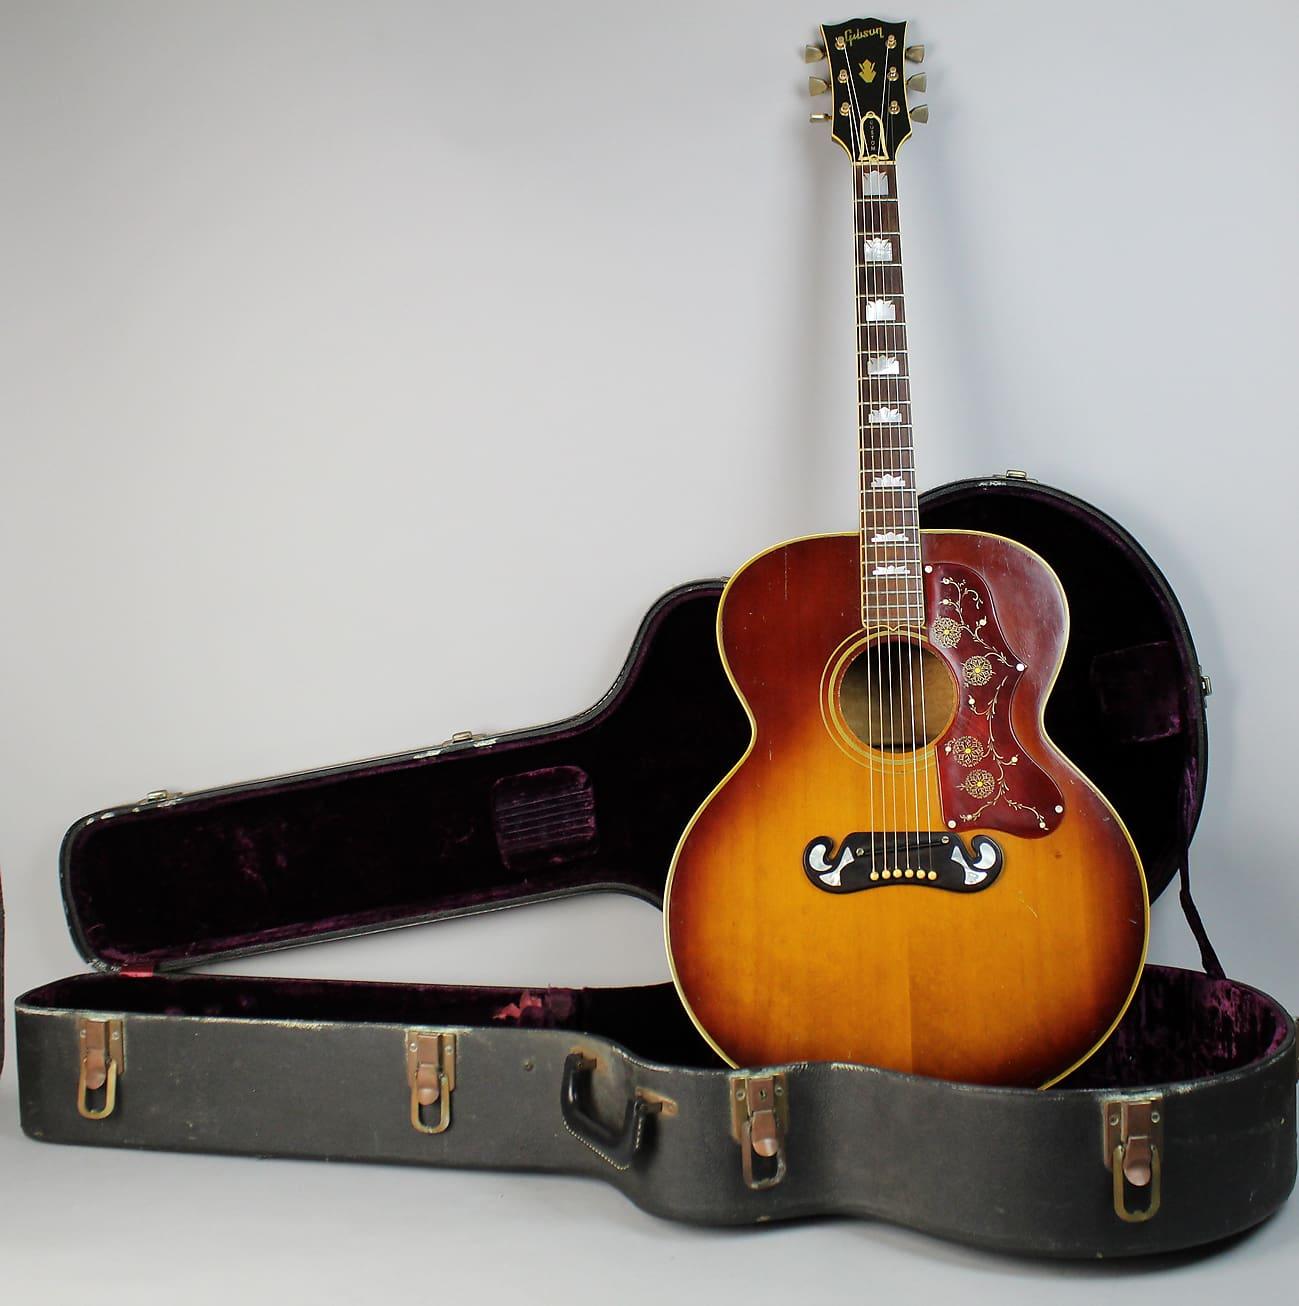 1968 Gibson J 200 Original Vintage Jumbo Sunburst Acoustic Guitar W OHSC